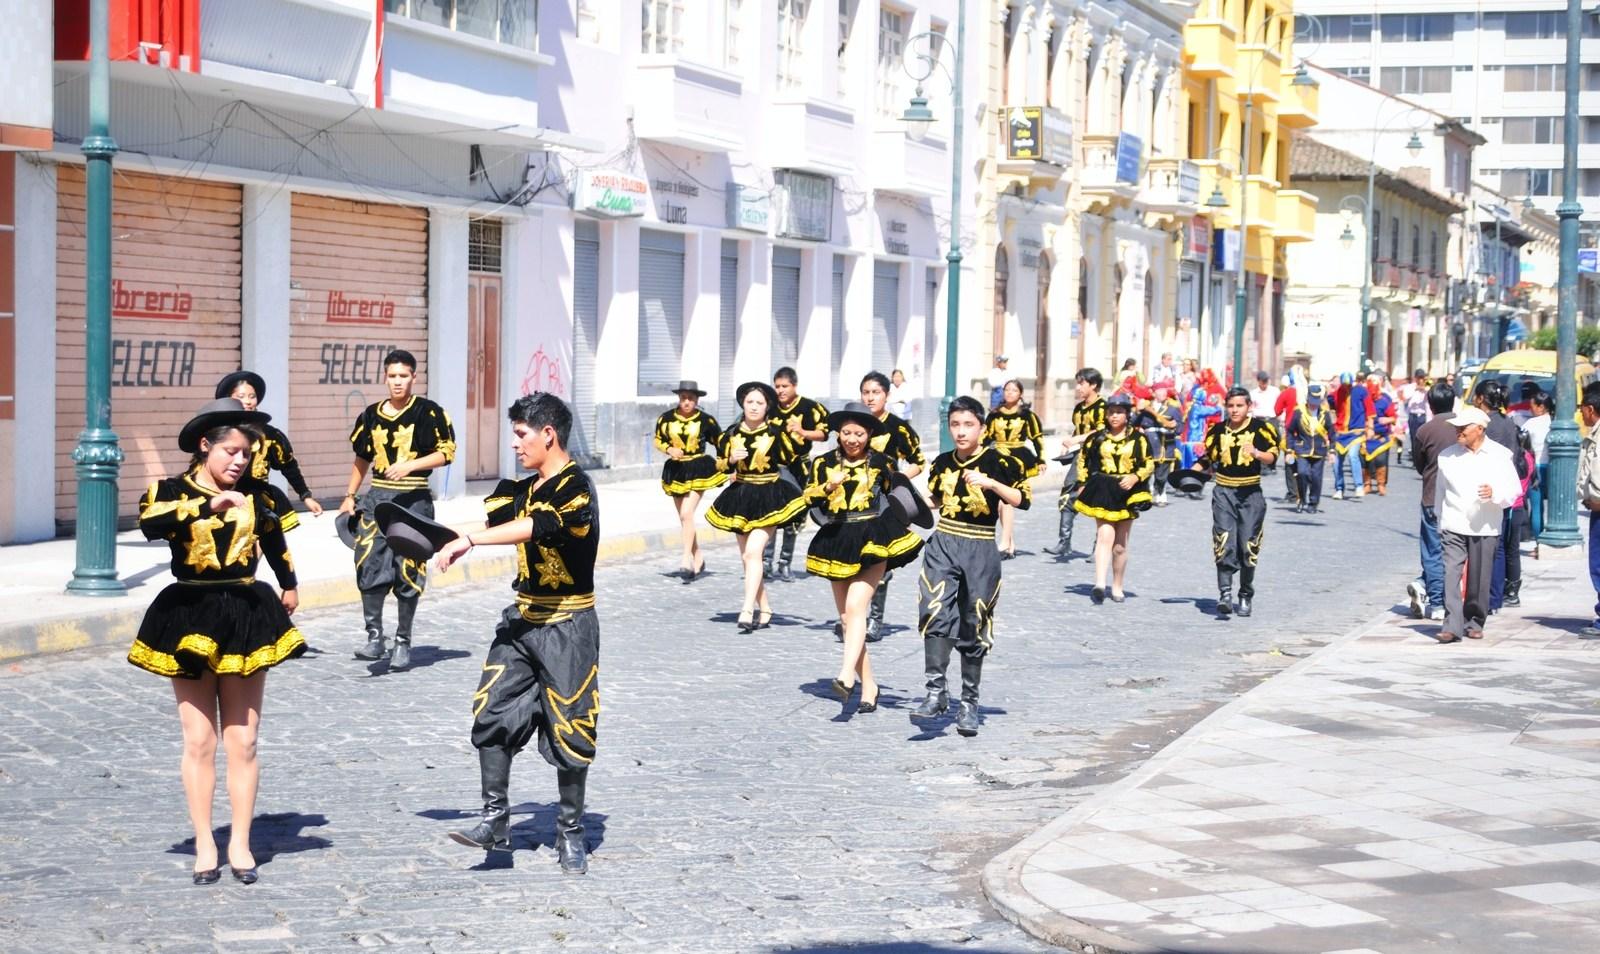 Carnaval de riobamba, Equateur Riobamba